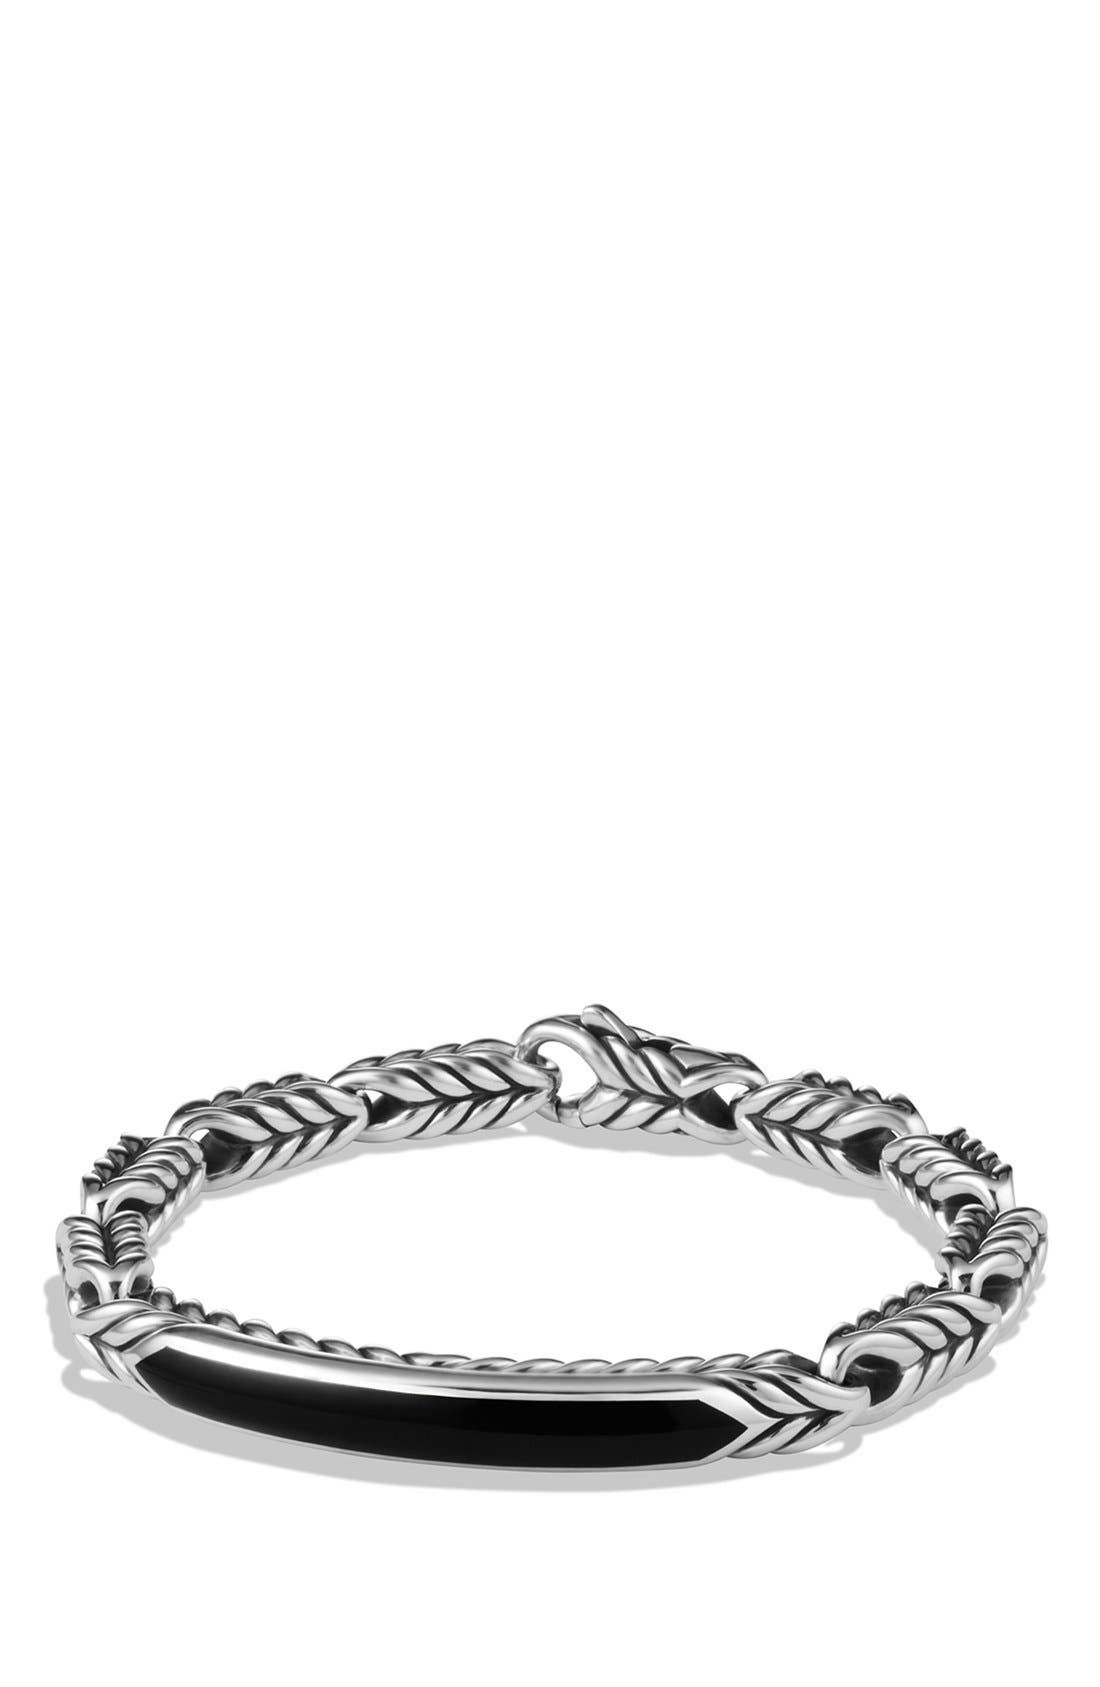 Alternate Image 1 Selected - David Yurman 'Chevron' ID Bracelet